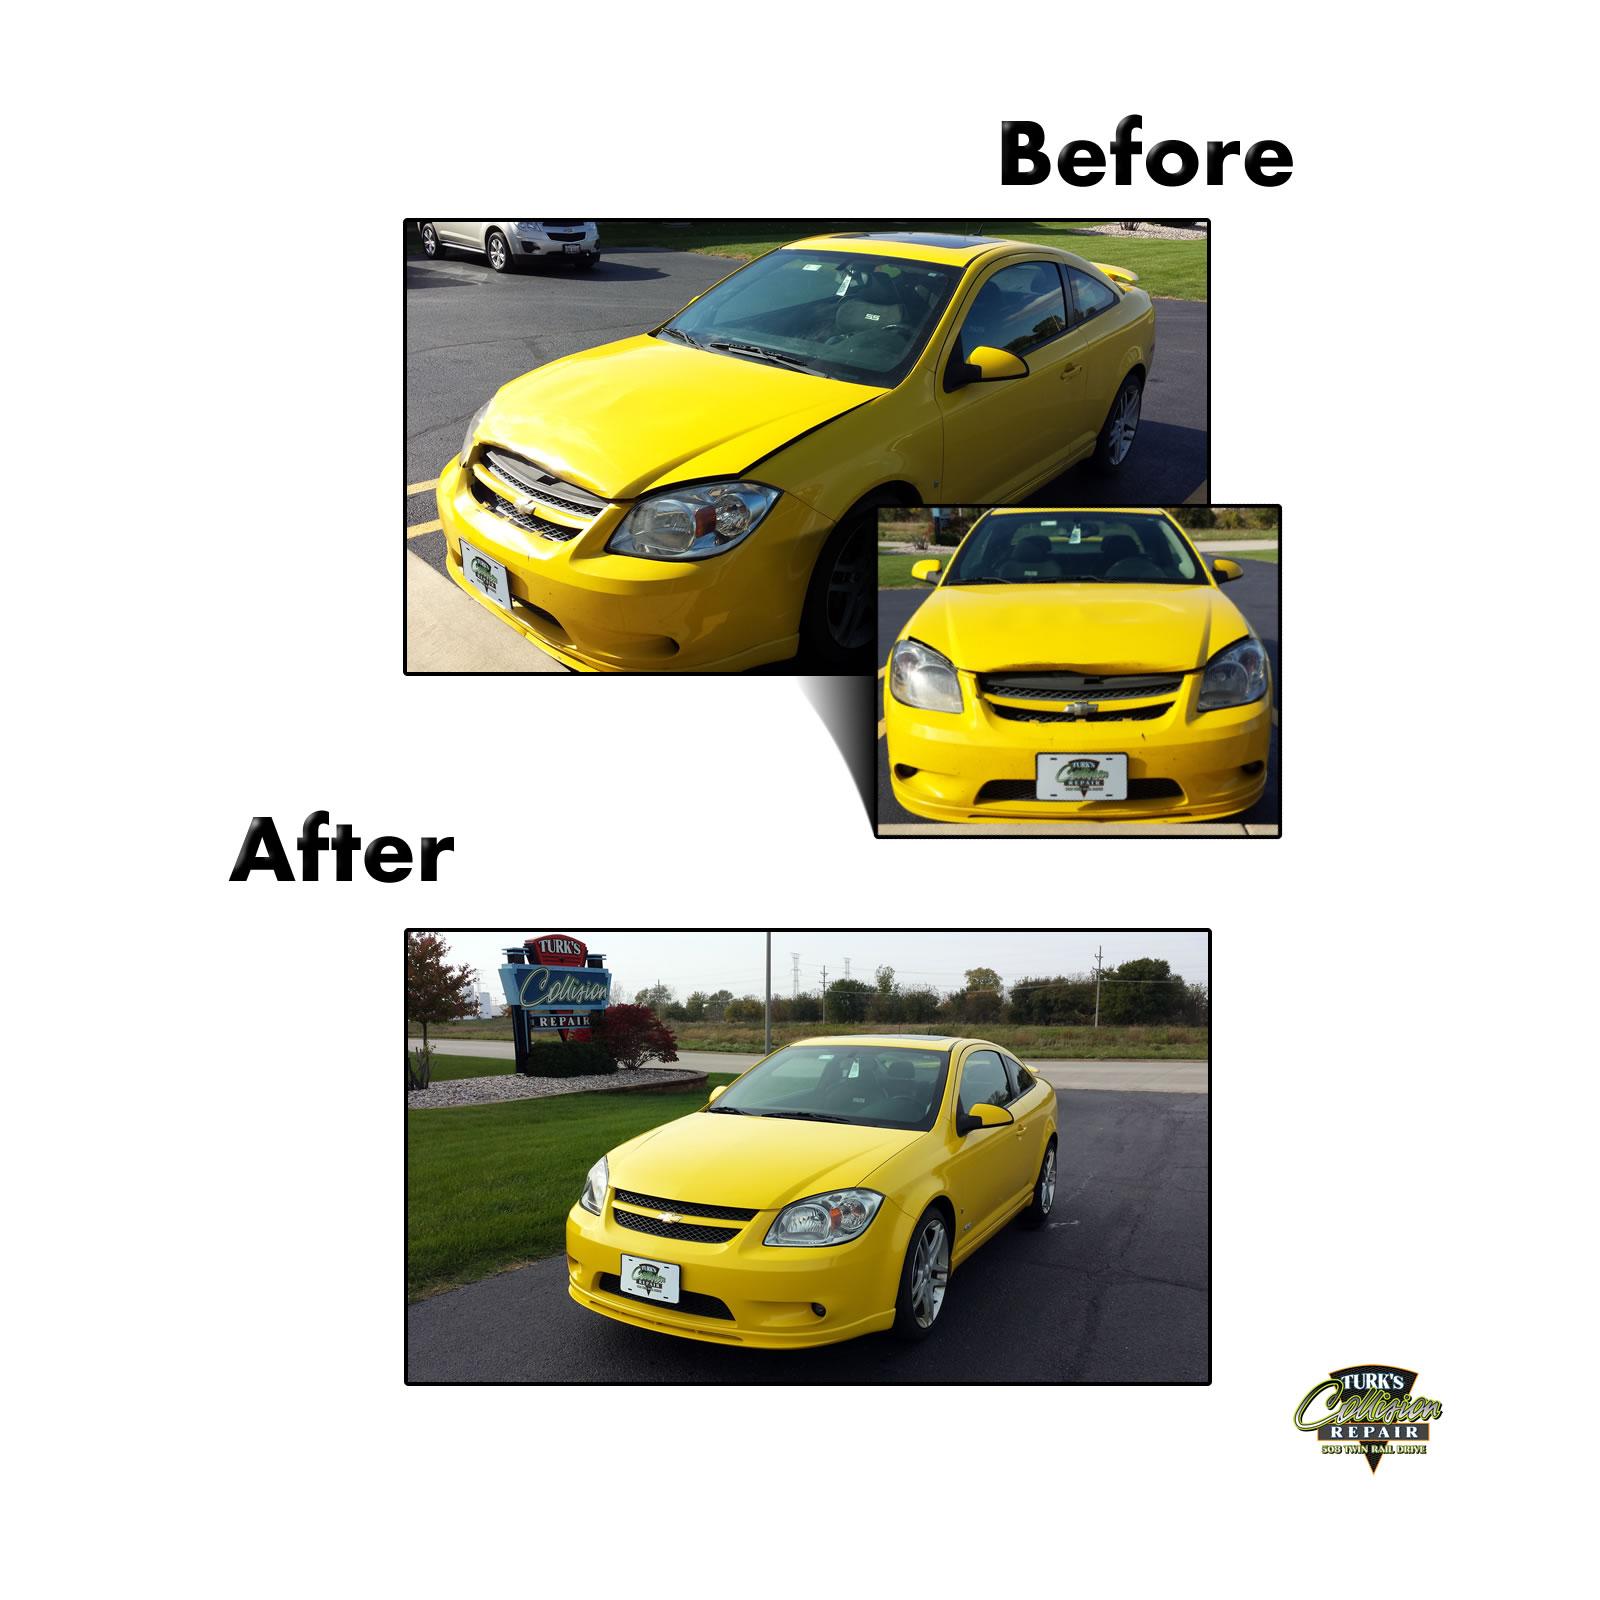 Chevy Cobalt Auto Body Repair Minooka IL 60447